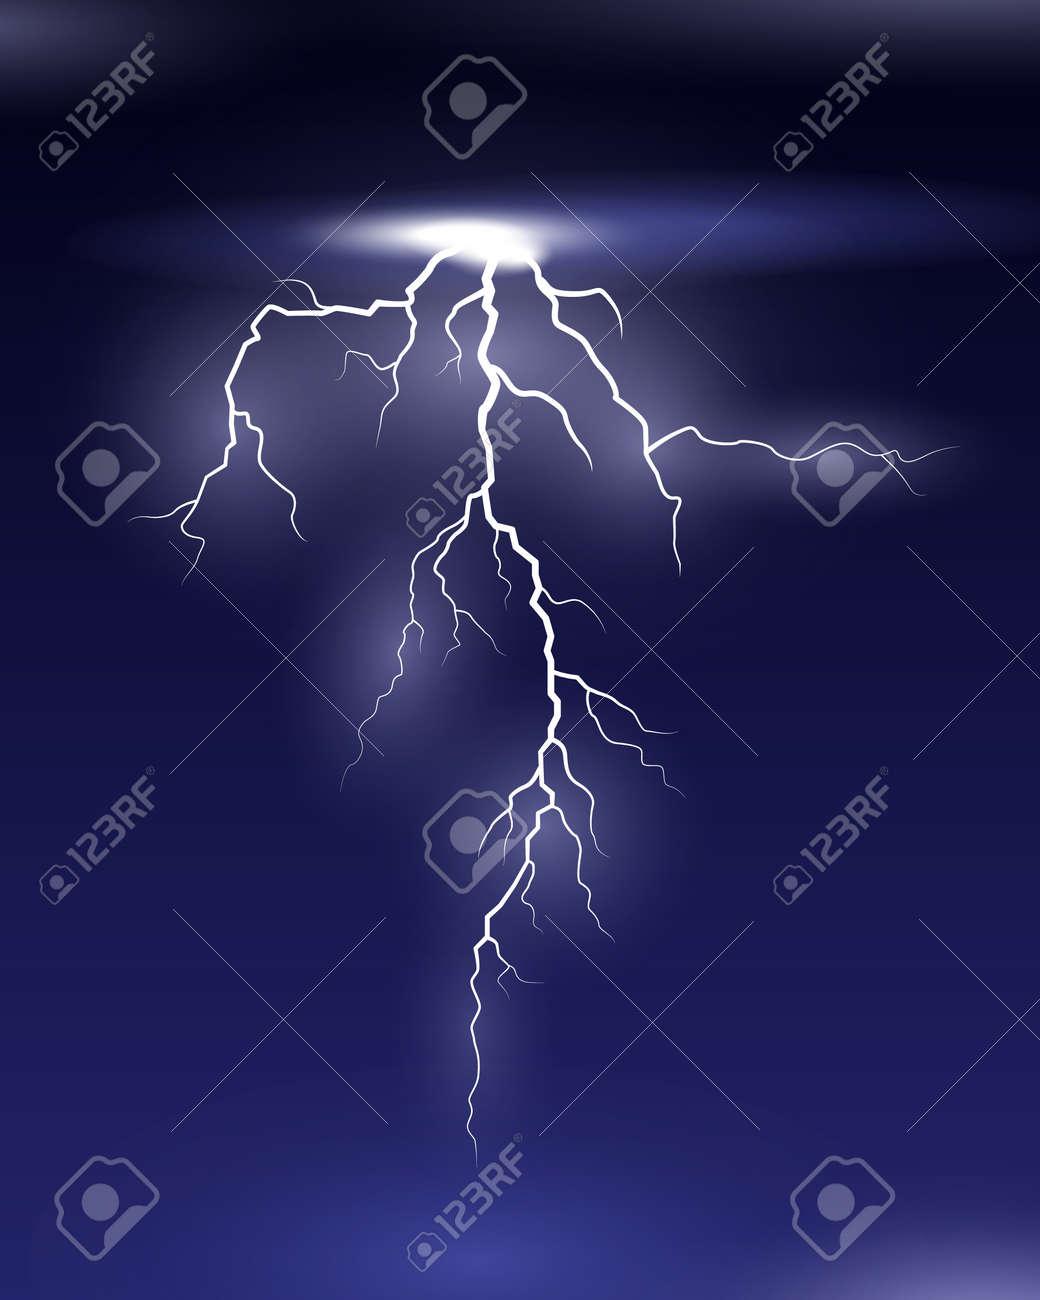 Vector Lightning on black and blue background - 166719216